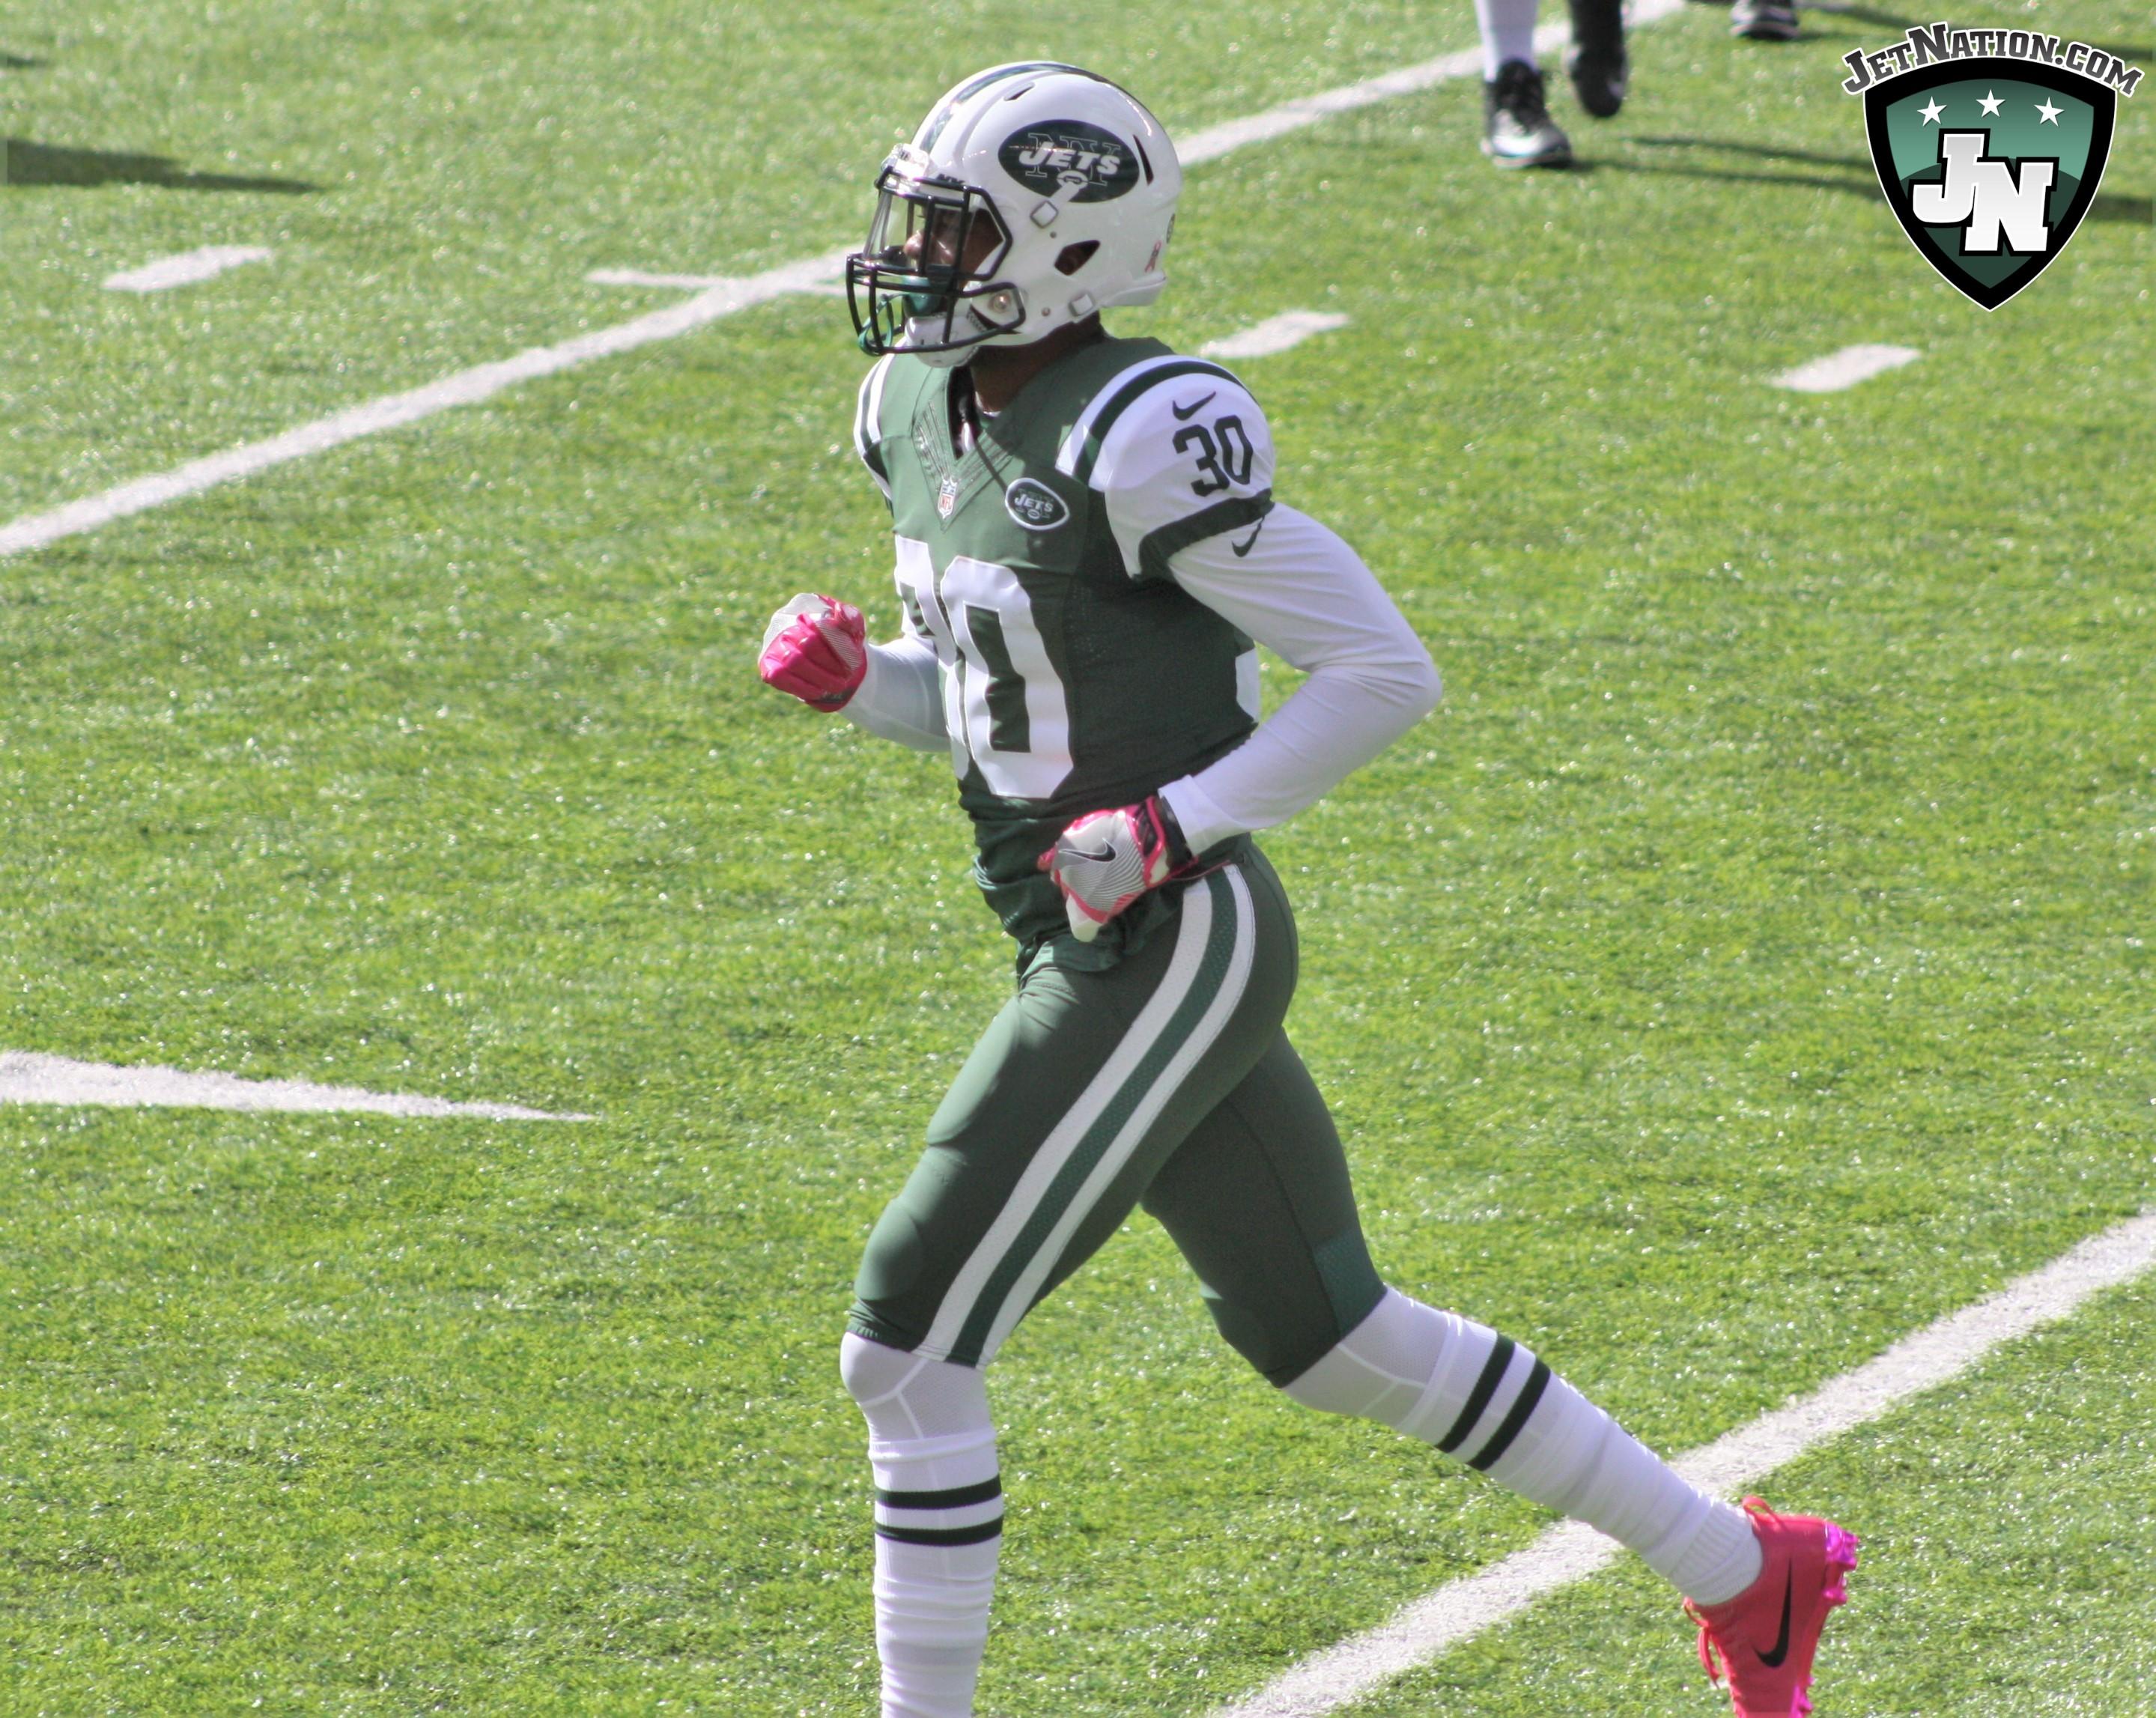 Report: Jets cut CB Nick Marshall